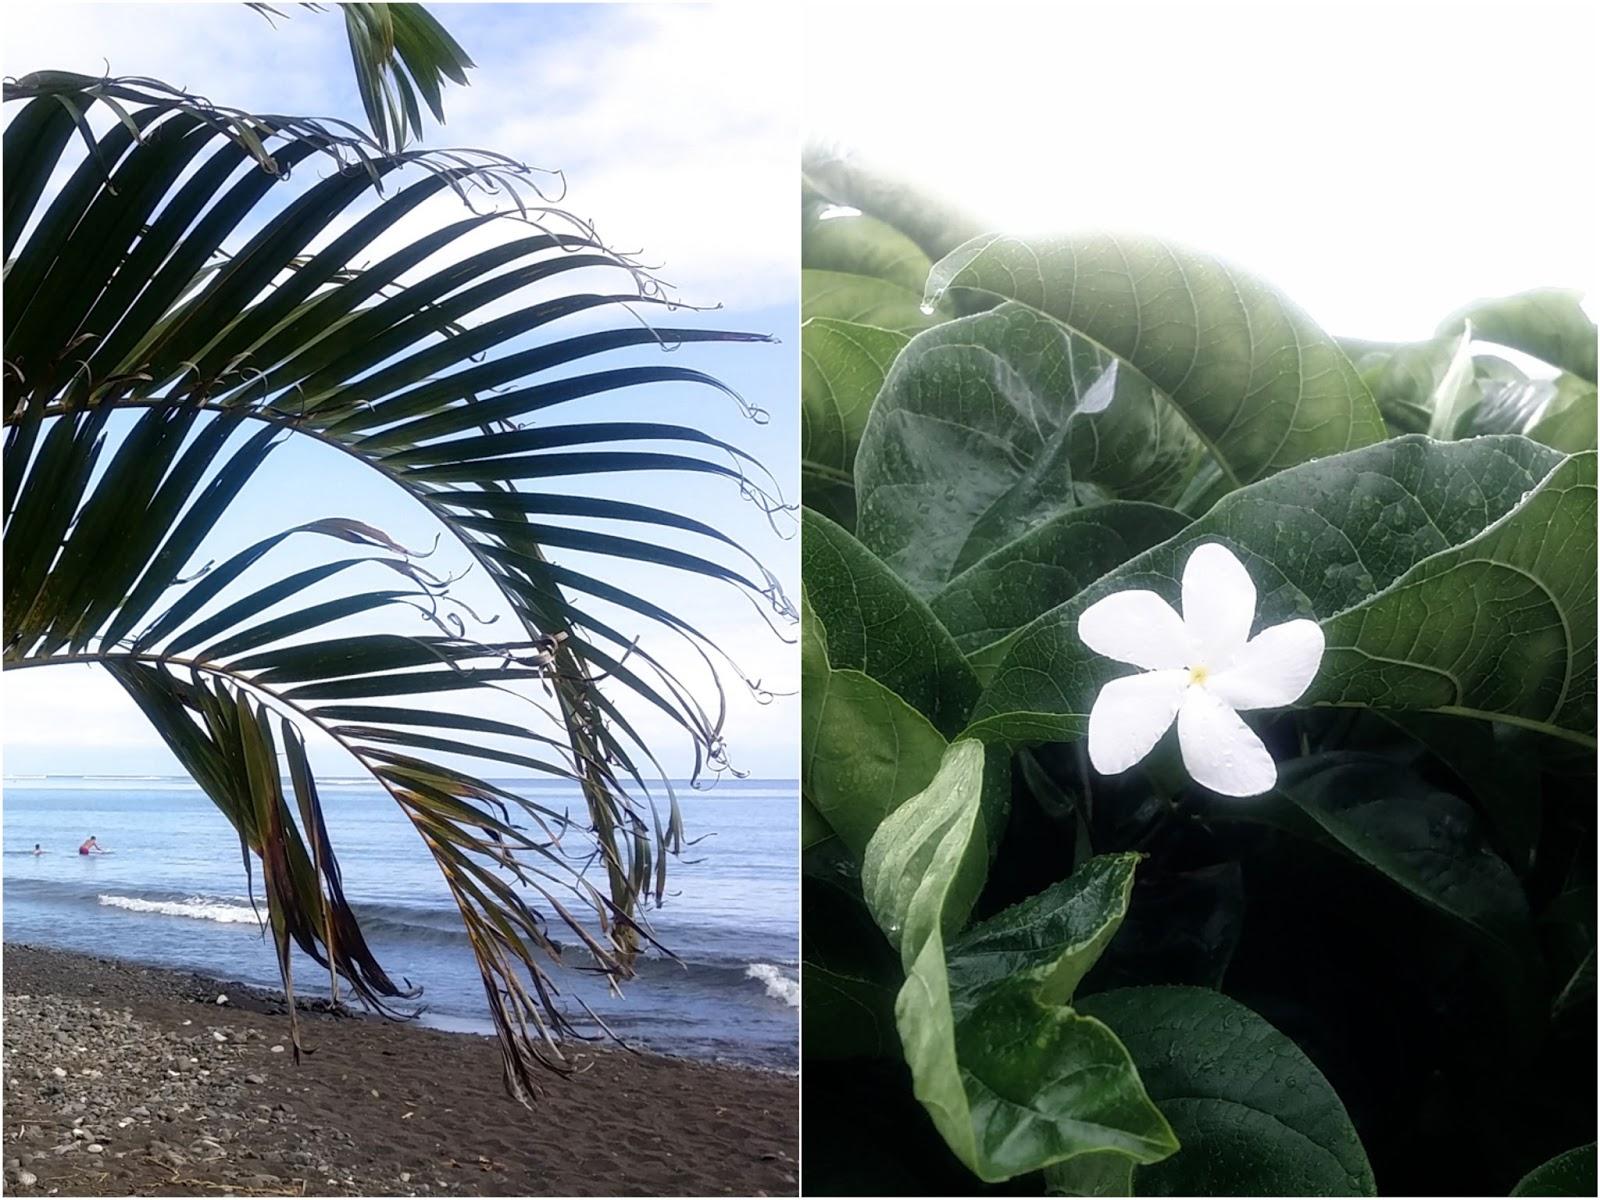 tahiti moorea french polynesia traveling